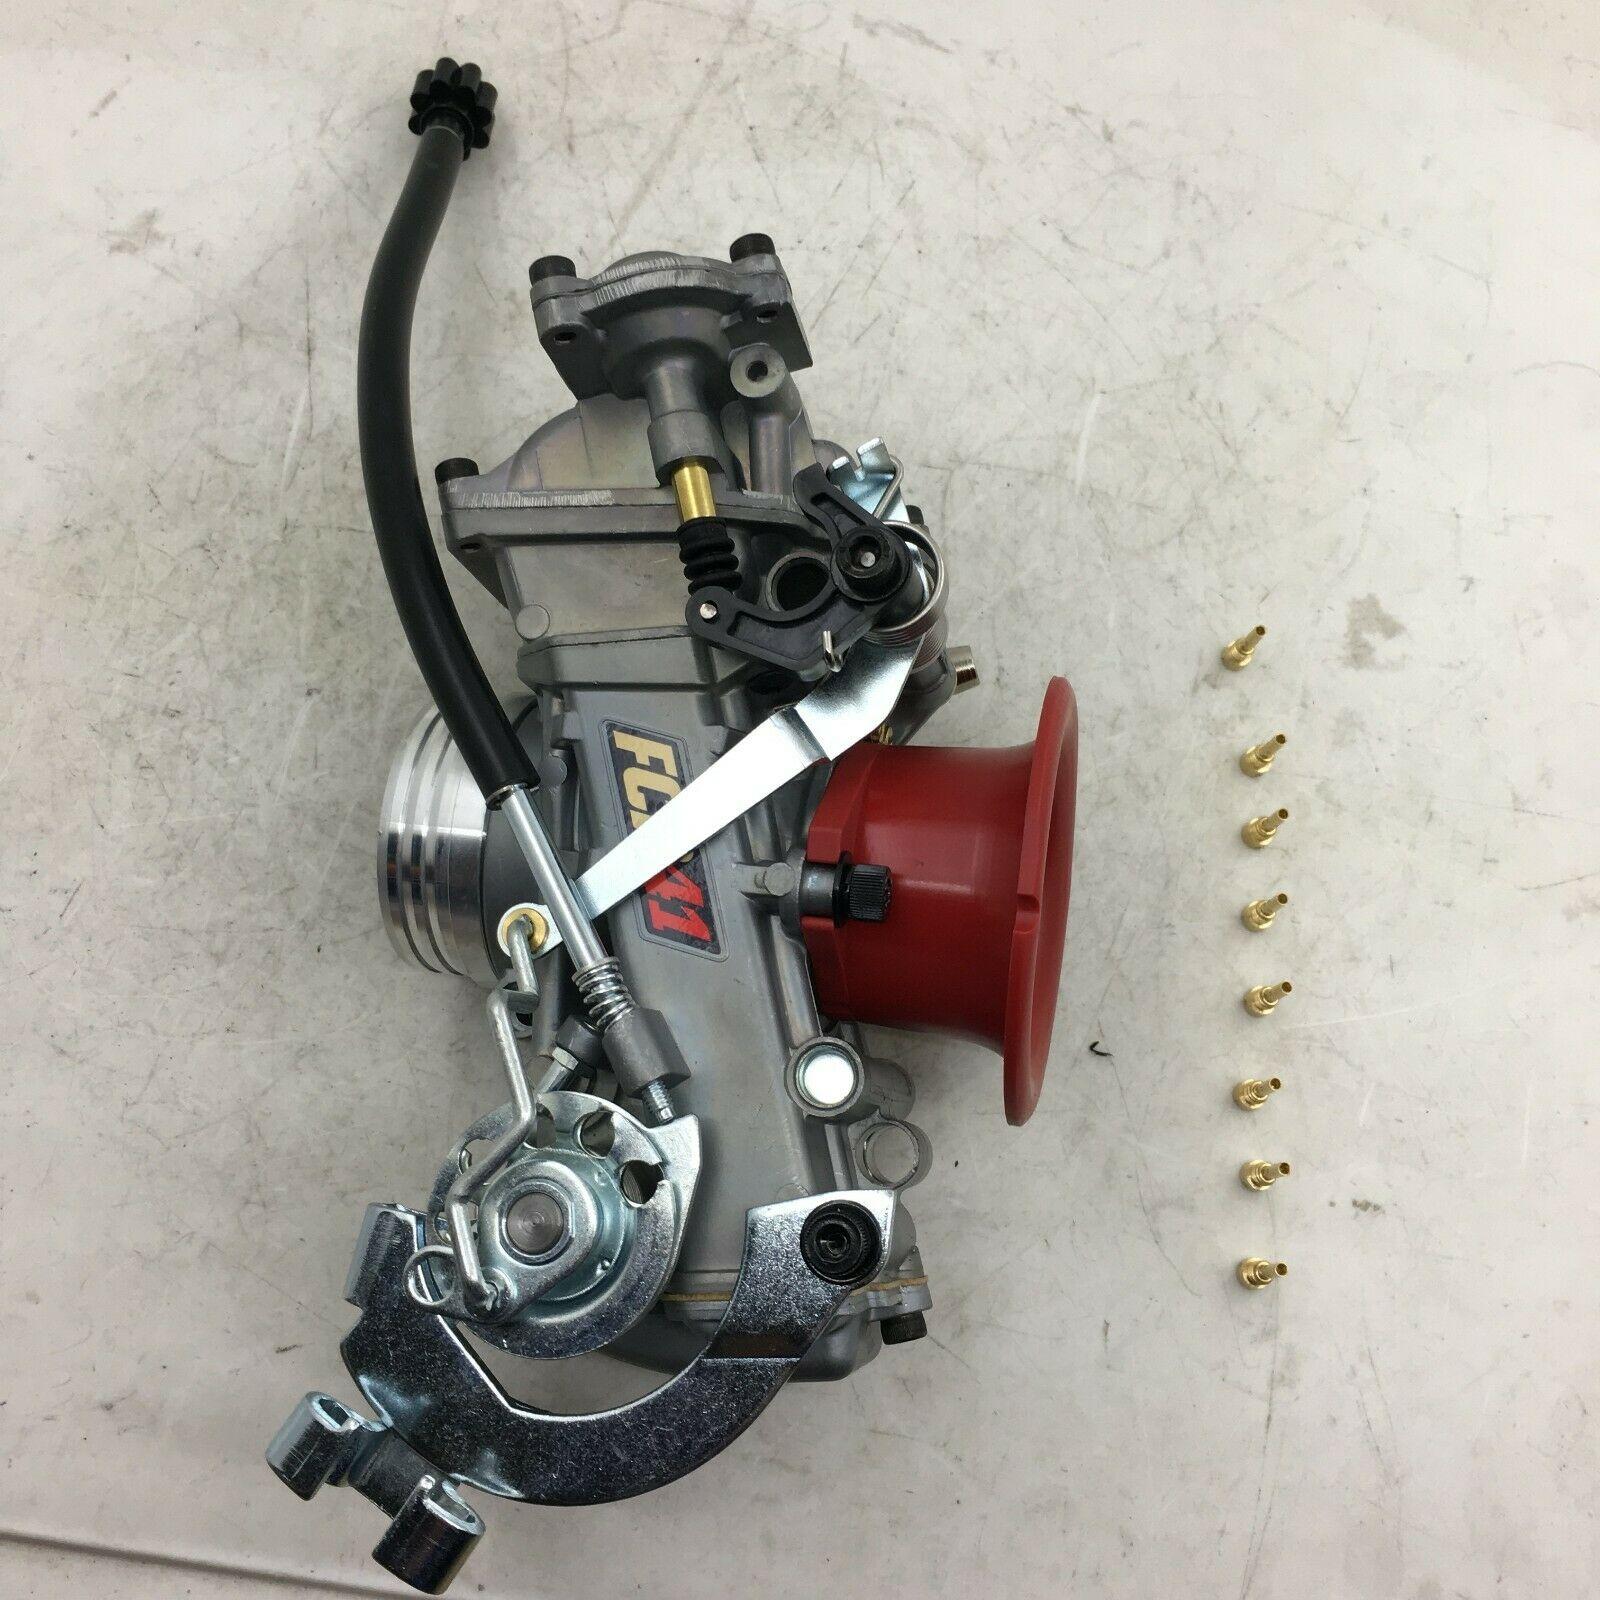 SherryBerg CARB FCR41 Slant Side Carburettor for Honda XR650 FOR Suzuki Husqvarna Yamaha 41MM 41 FCR FCR CARBURETOR vergaser